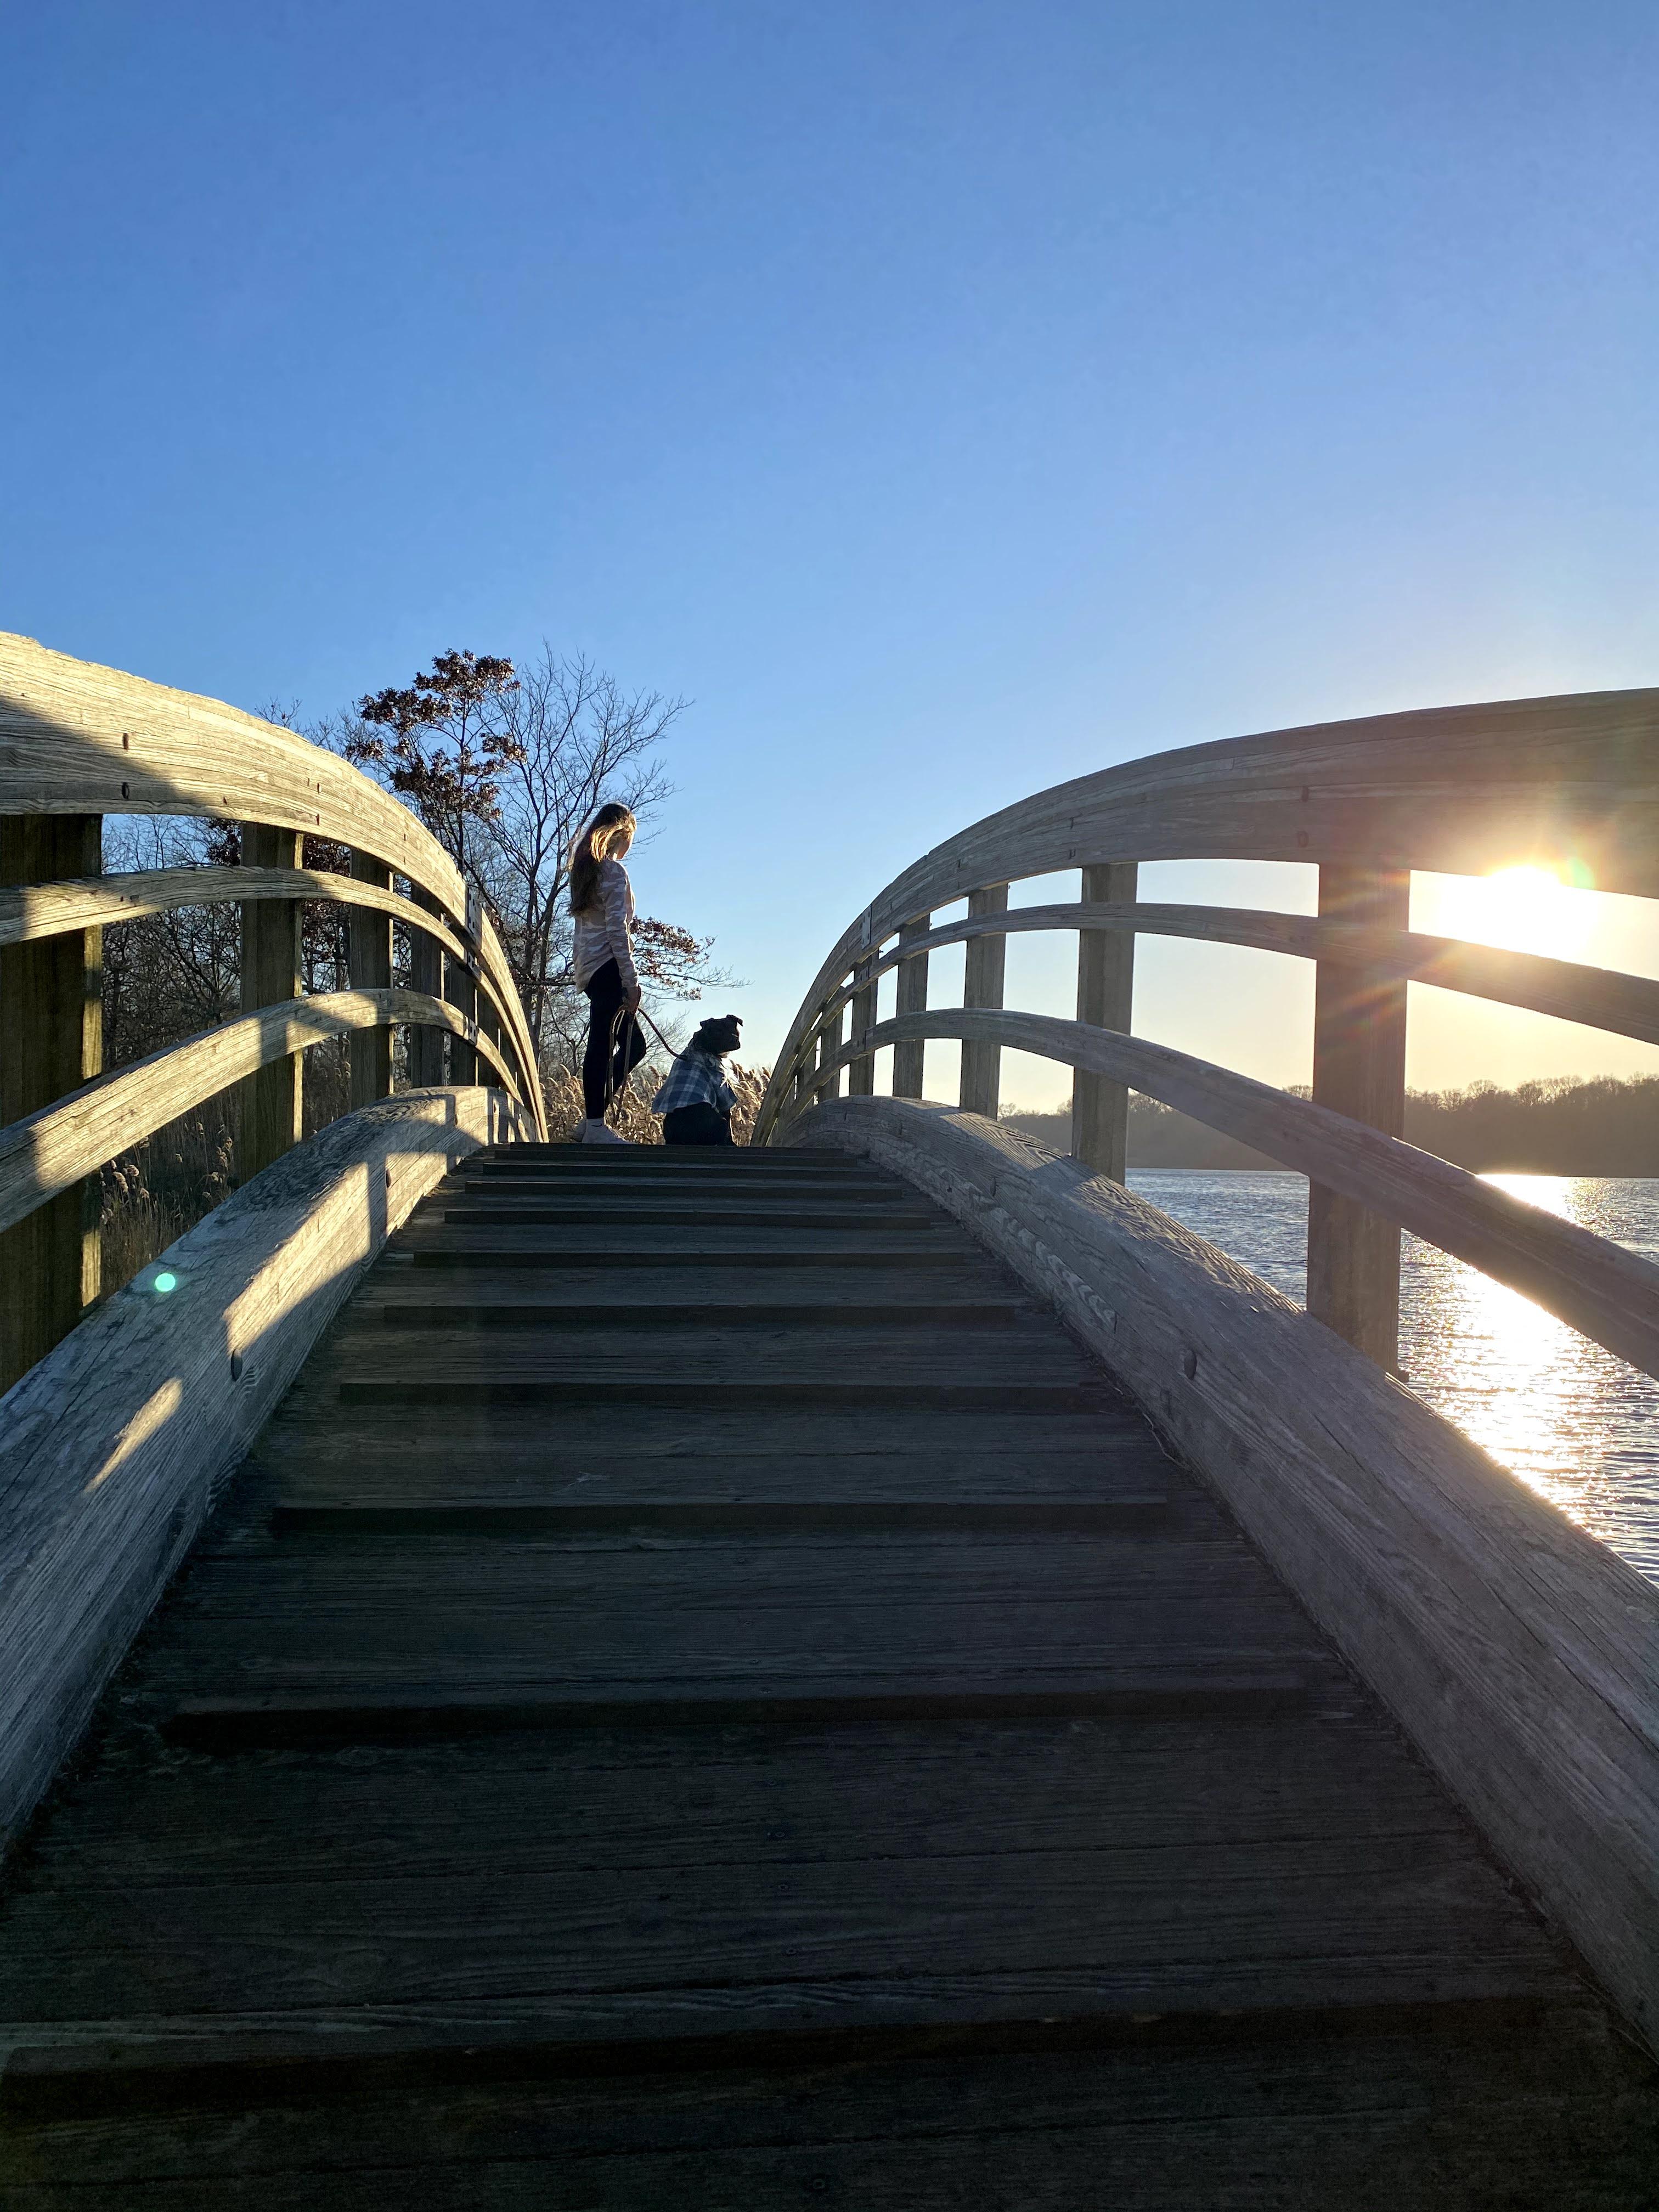 Avery & Archie on Ryan Park Bridge